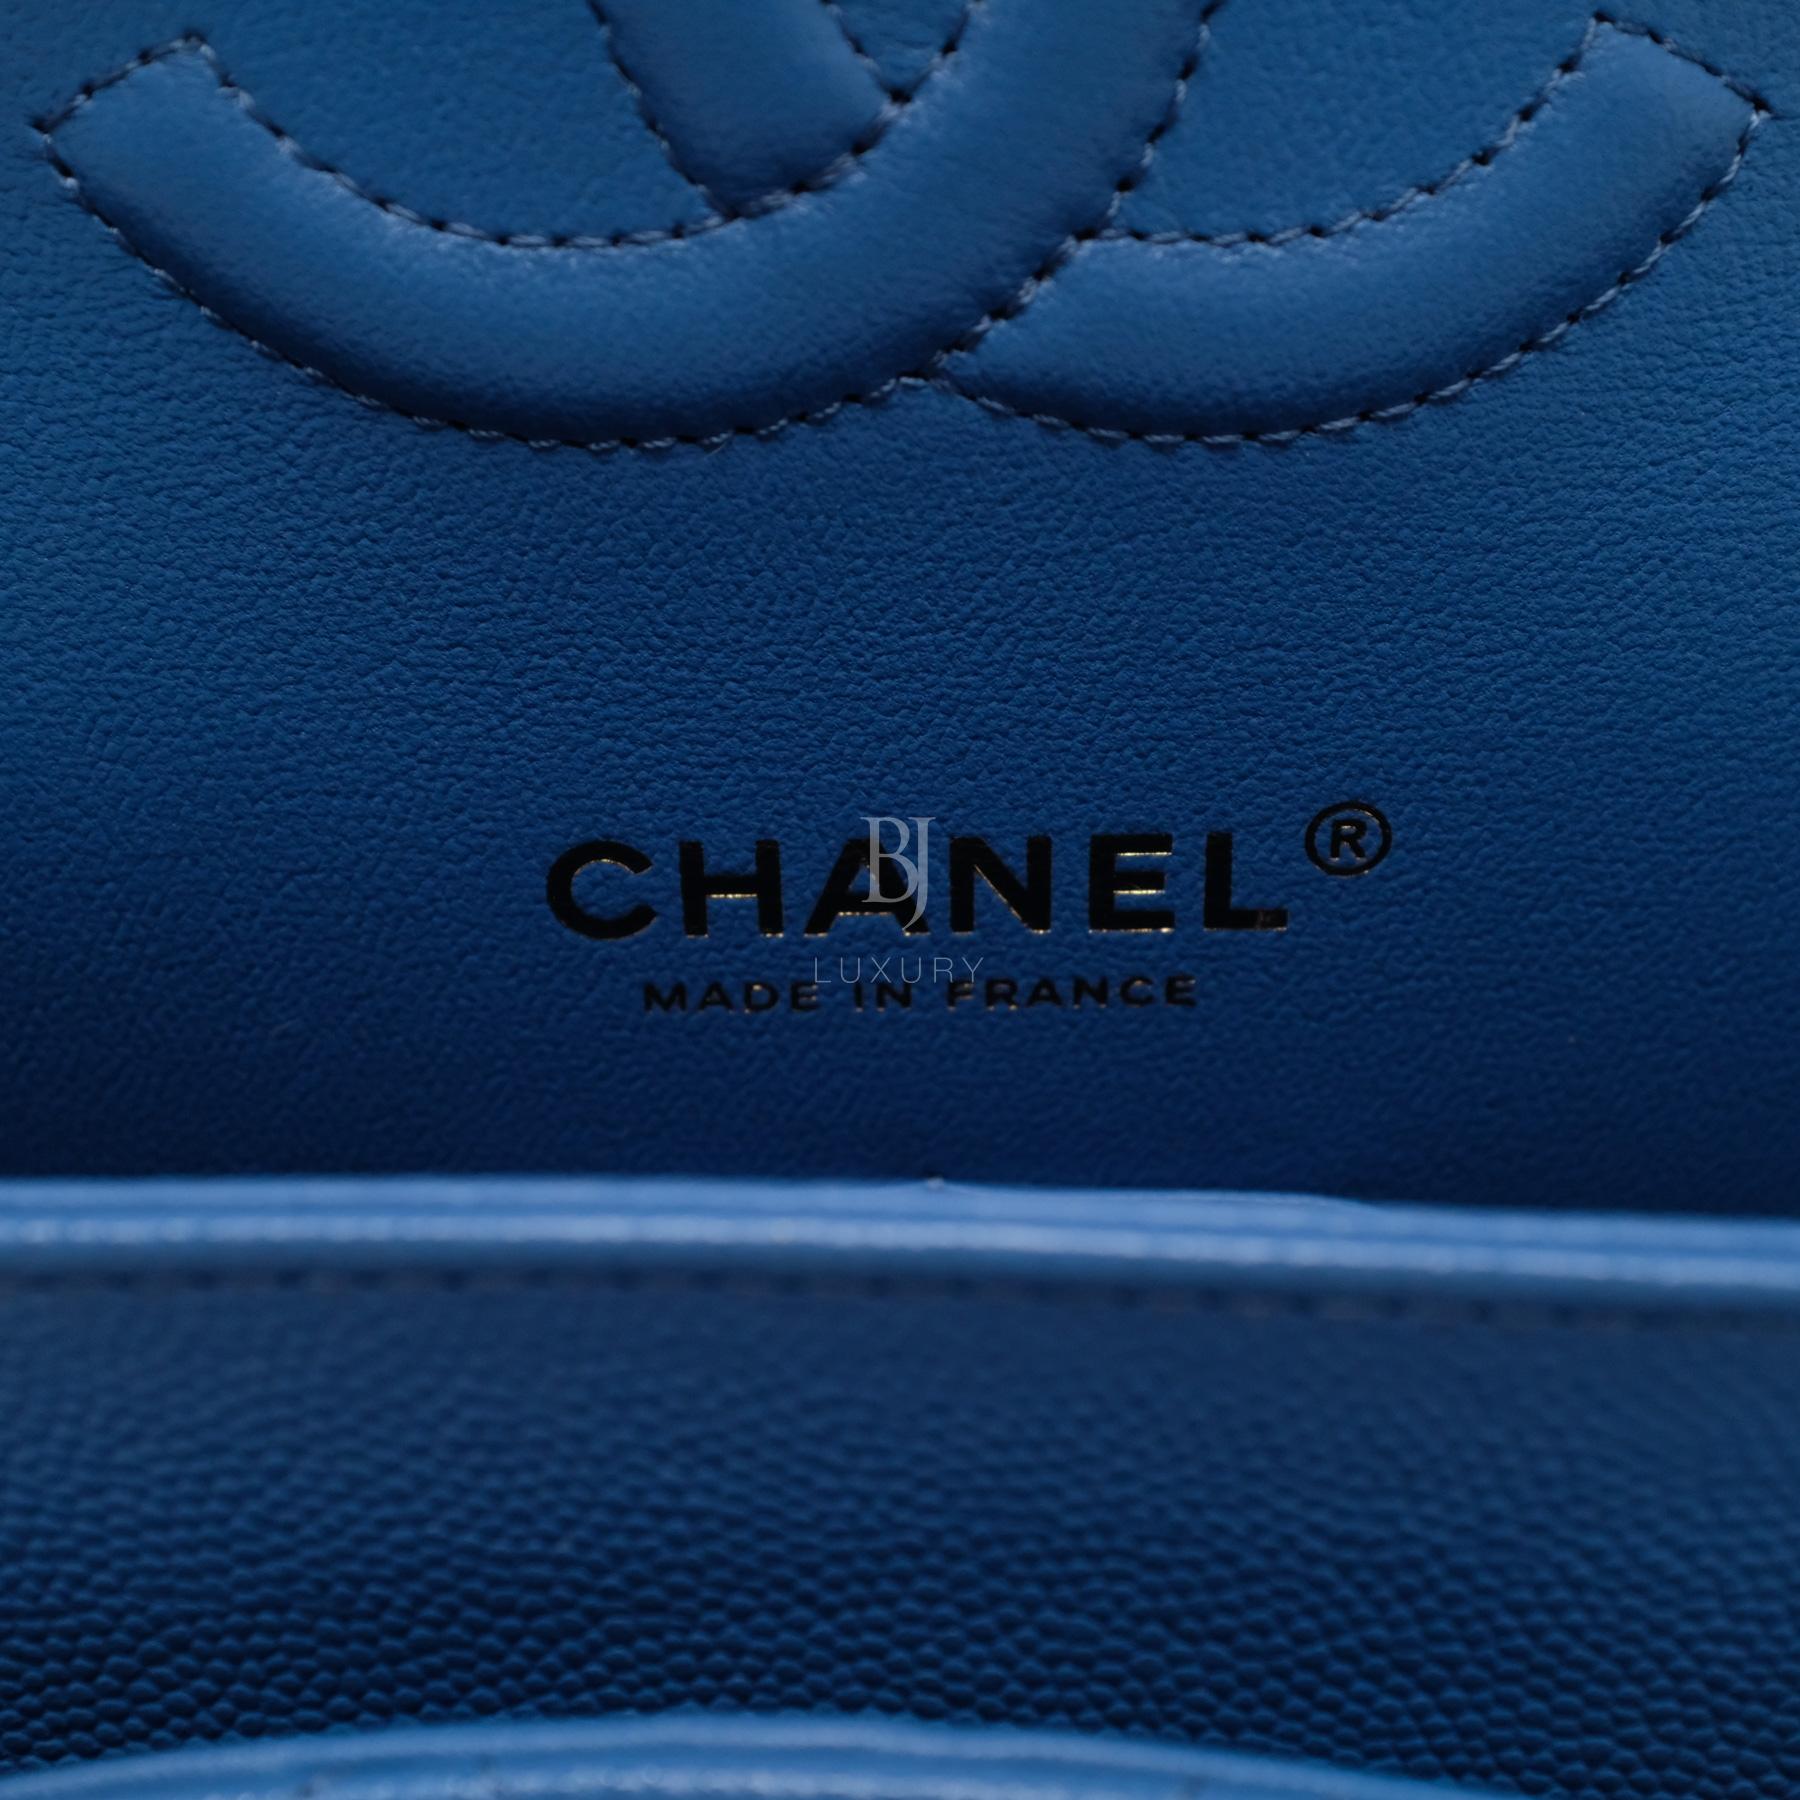 CHANEL-CLASSICHANDBAG-MEDIUM-BLUE-CAVIAR-DSCF6549.jpg